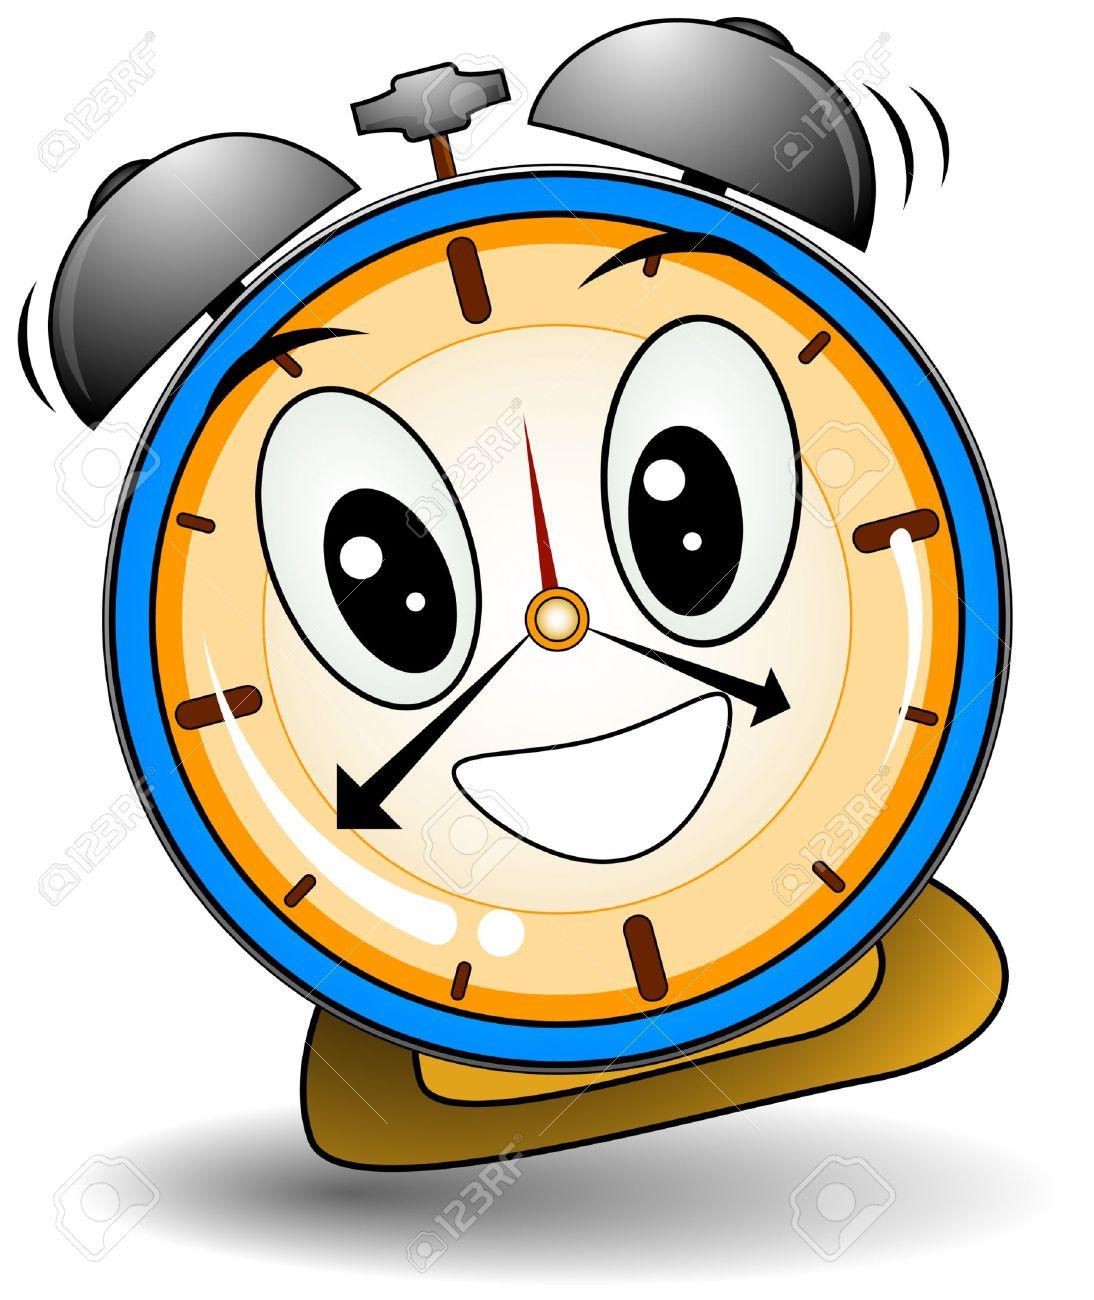 Clock clipart cute. Alarm station